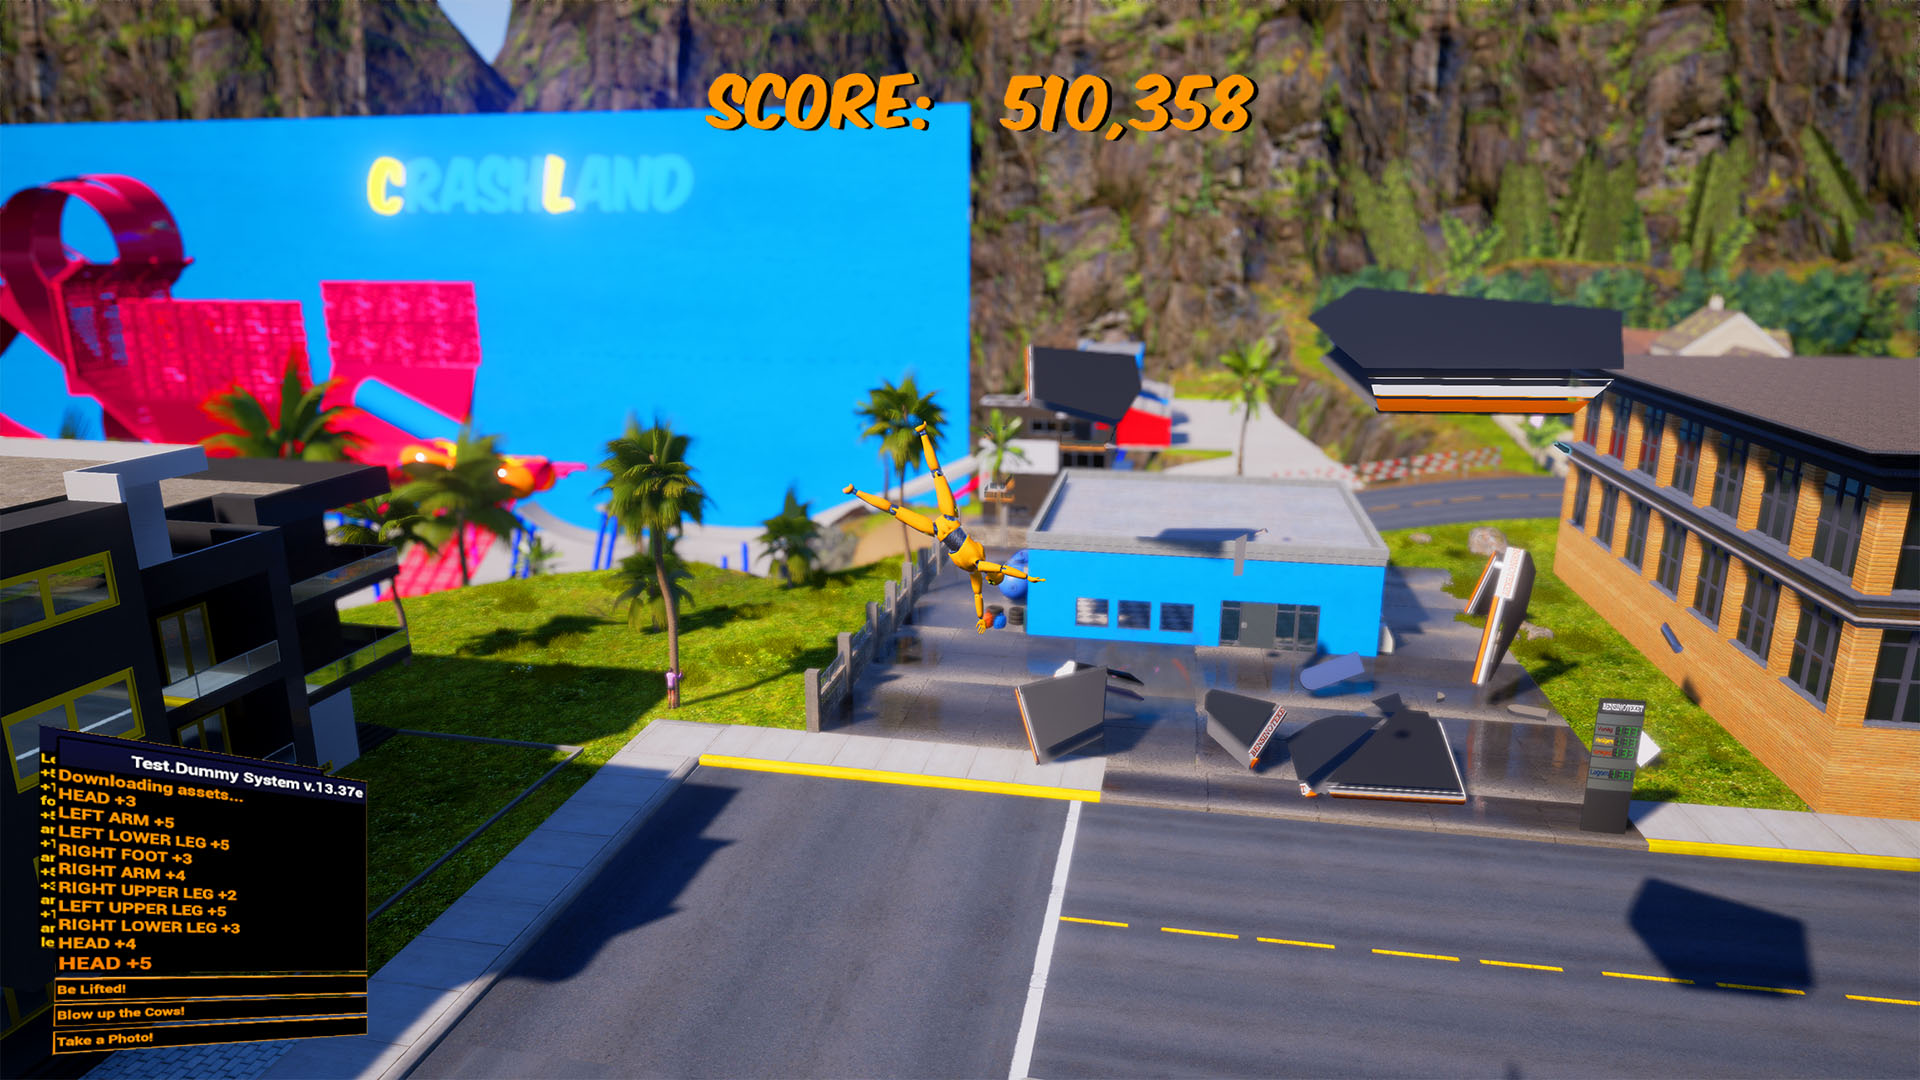 Whiplash - Crash Valley Screenshot 1